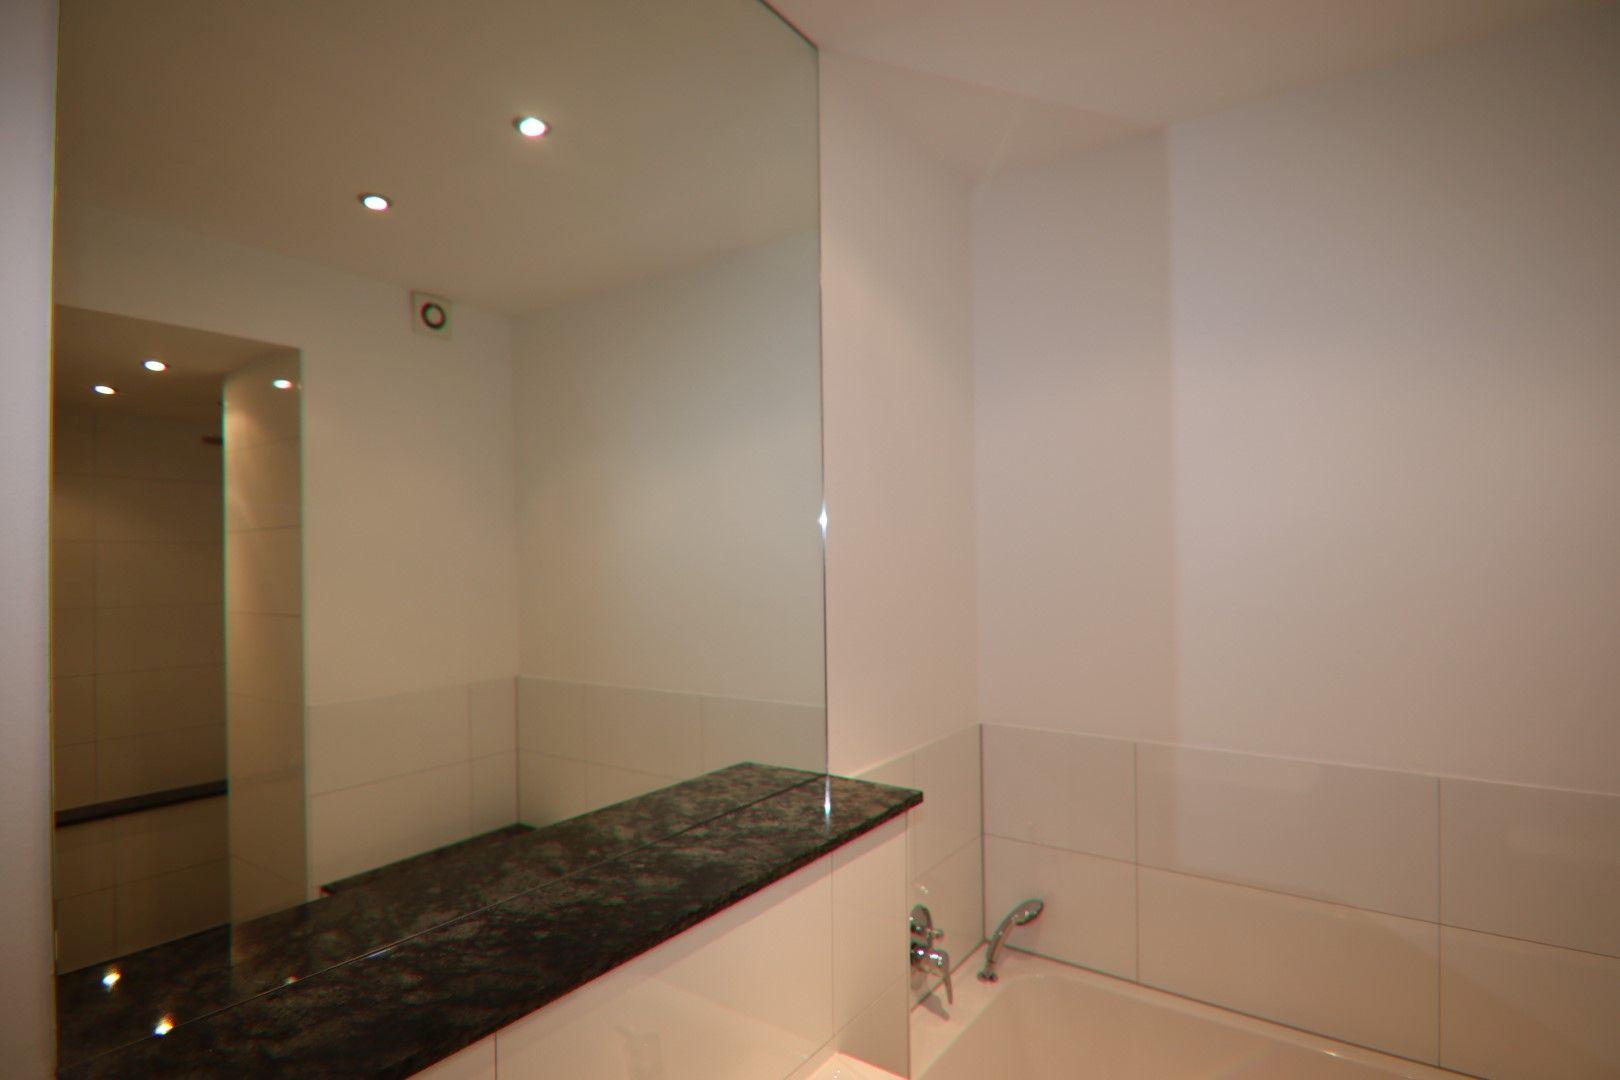 Immobilie Nr.0271 - 3-Zimmer-Altbauwohnung mit Aufzug im 3.OG - Bild 8.jpg